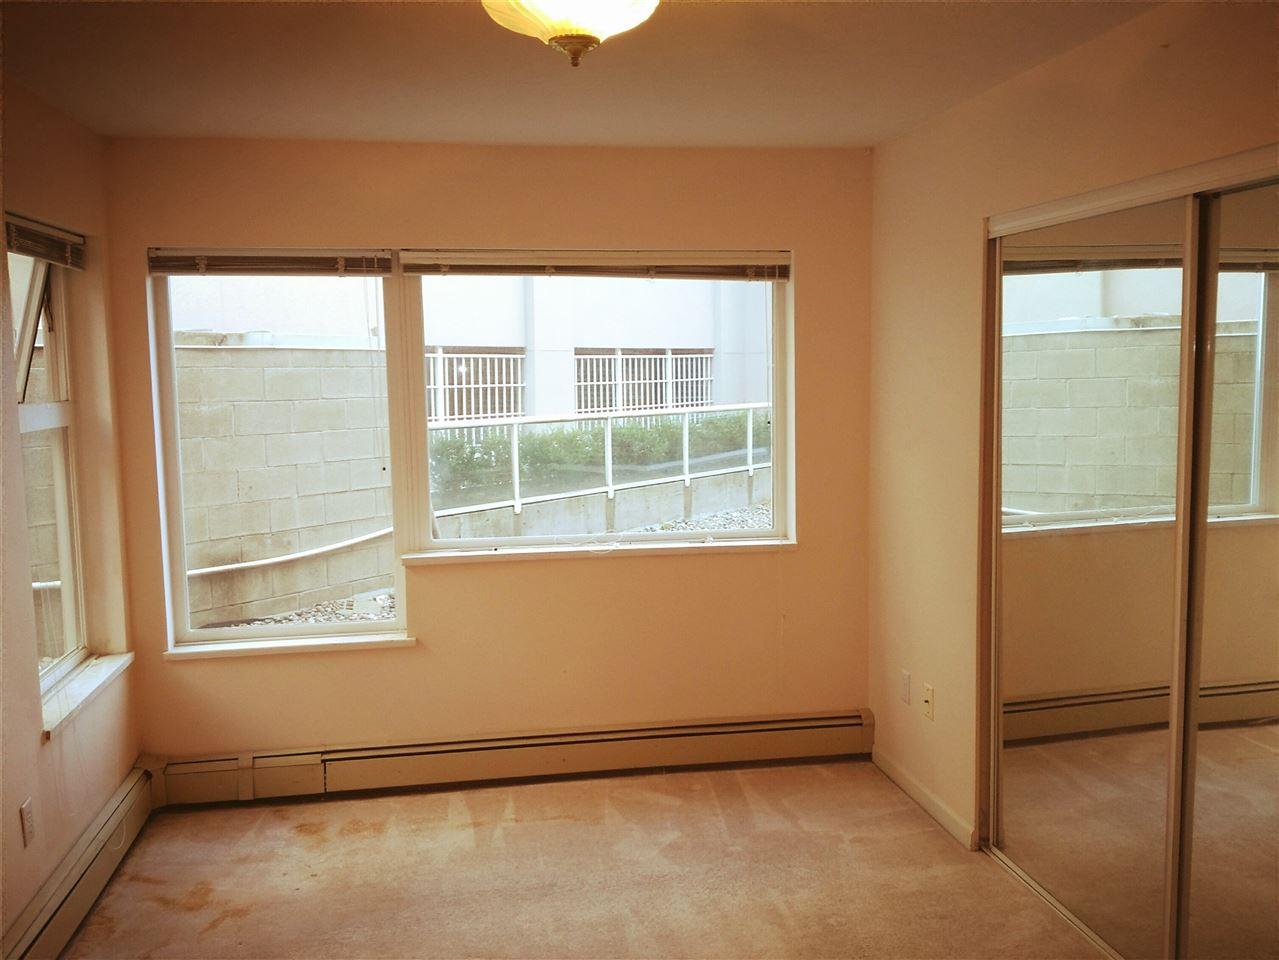 Condo Apartment at 106 15233 PACIFIC AVENUE, Unit 106, South Surrey White Rock, British Columbia. Image 4